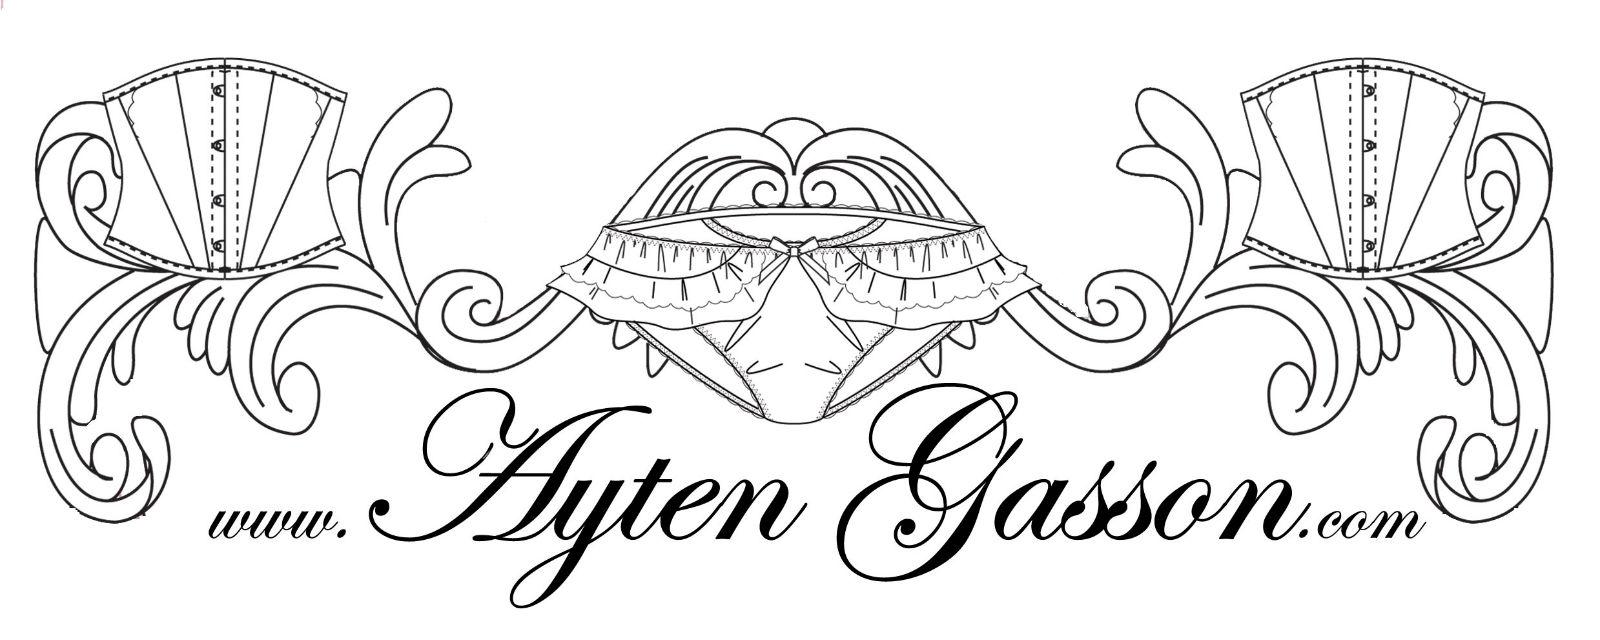 Ayten Gasson Image